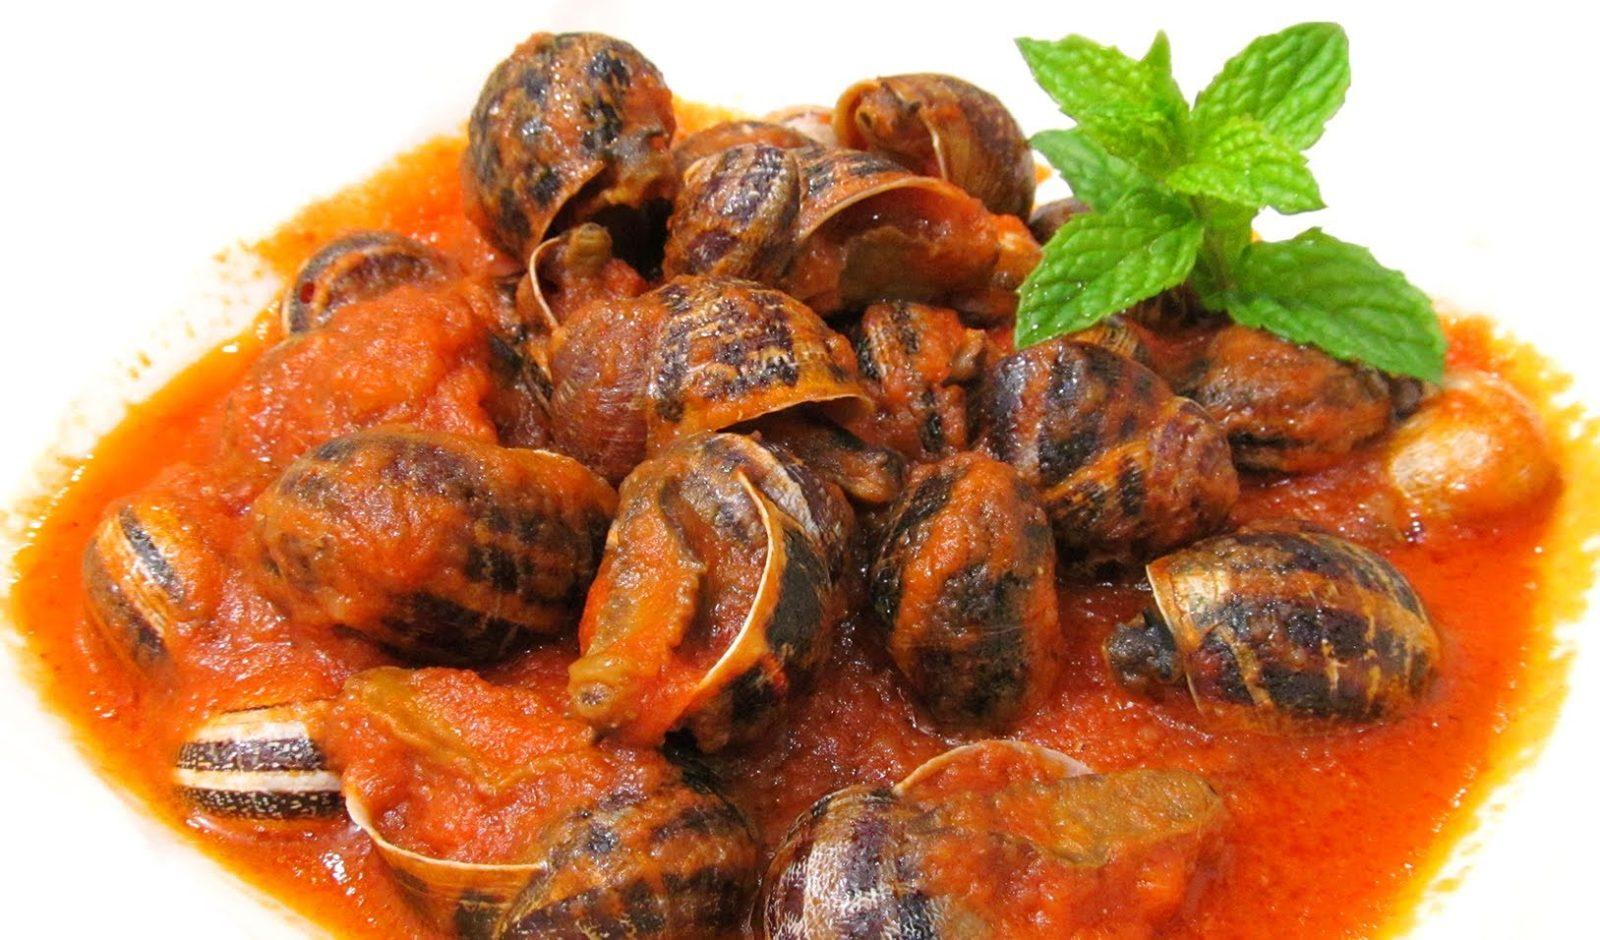 Сaracoles en salsa – улитки в соусе.